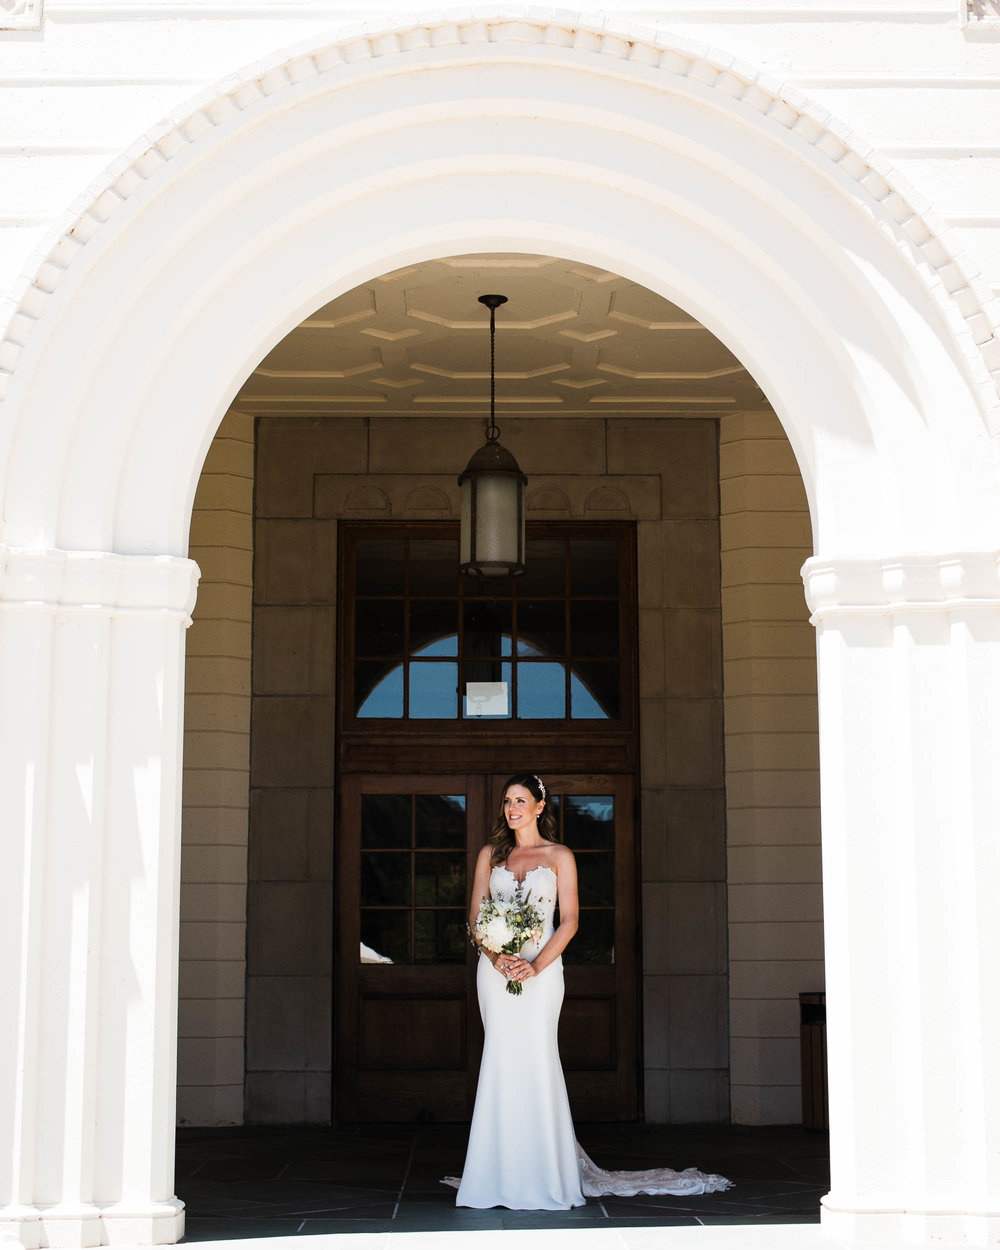 062318_G+L_San Anselmo Wedding_Buena Lane Photography_0507ER.jpg